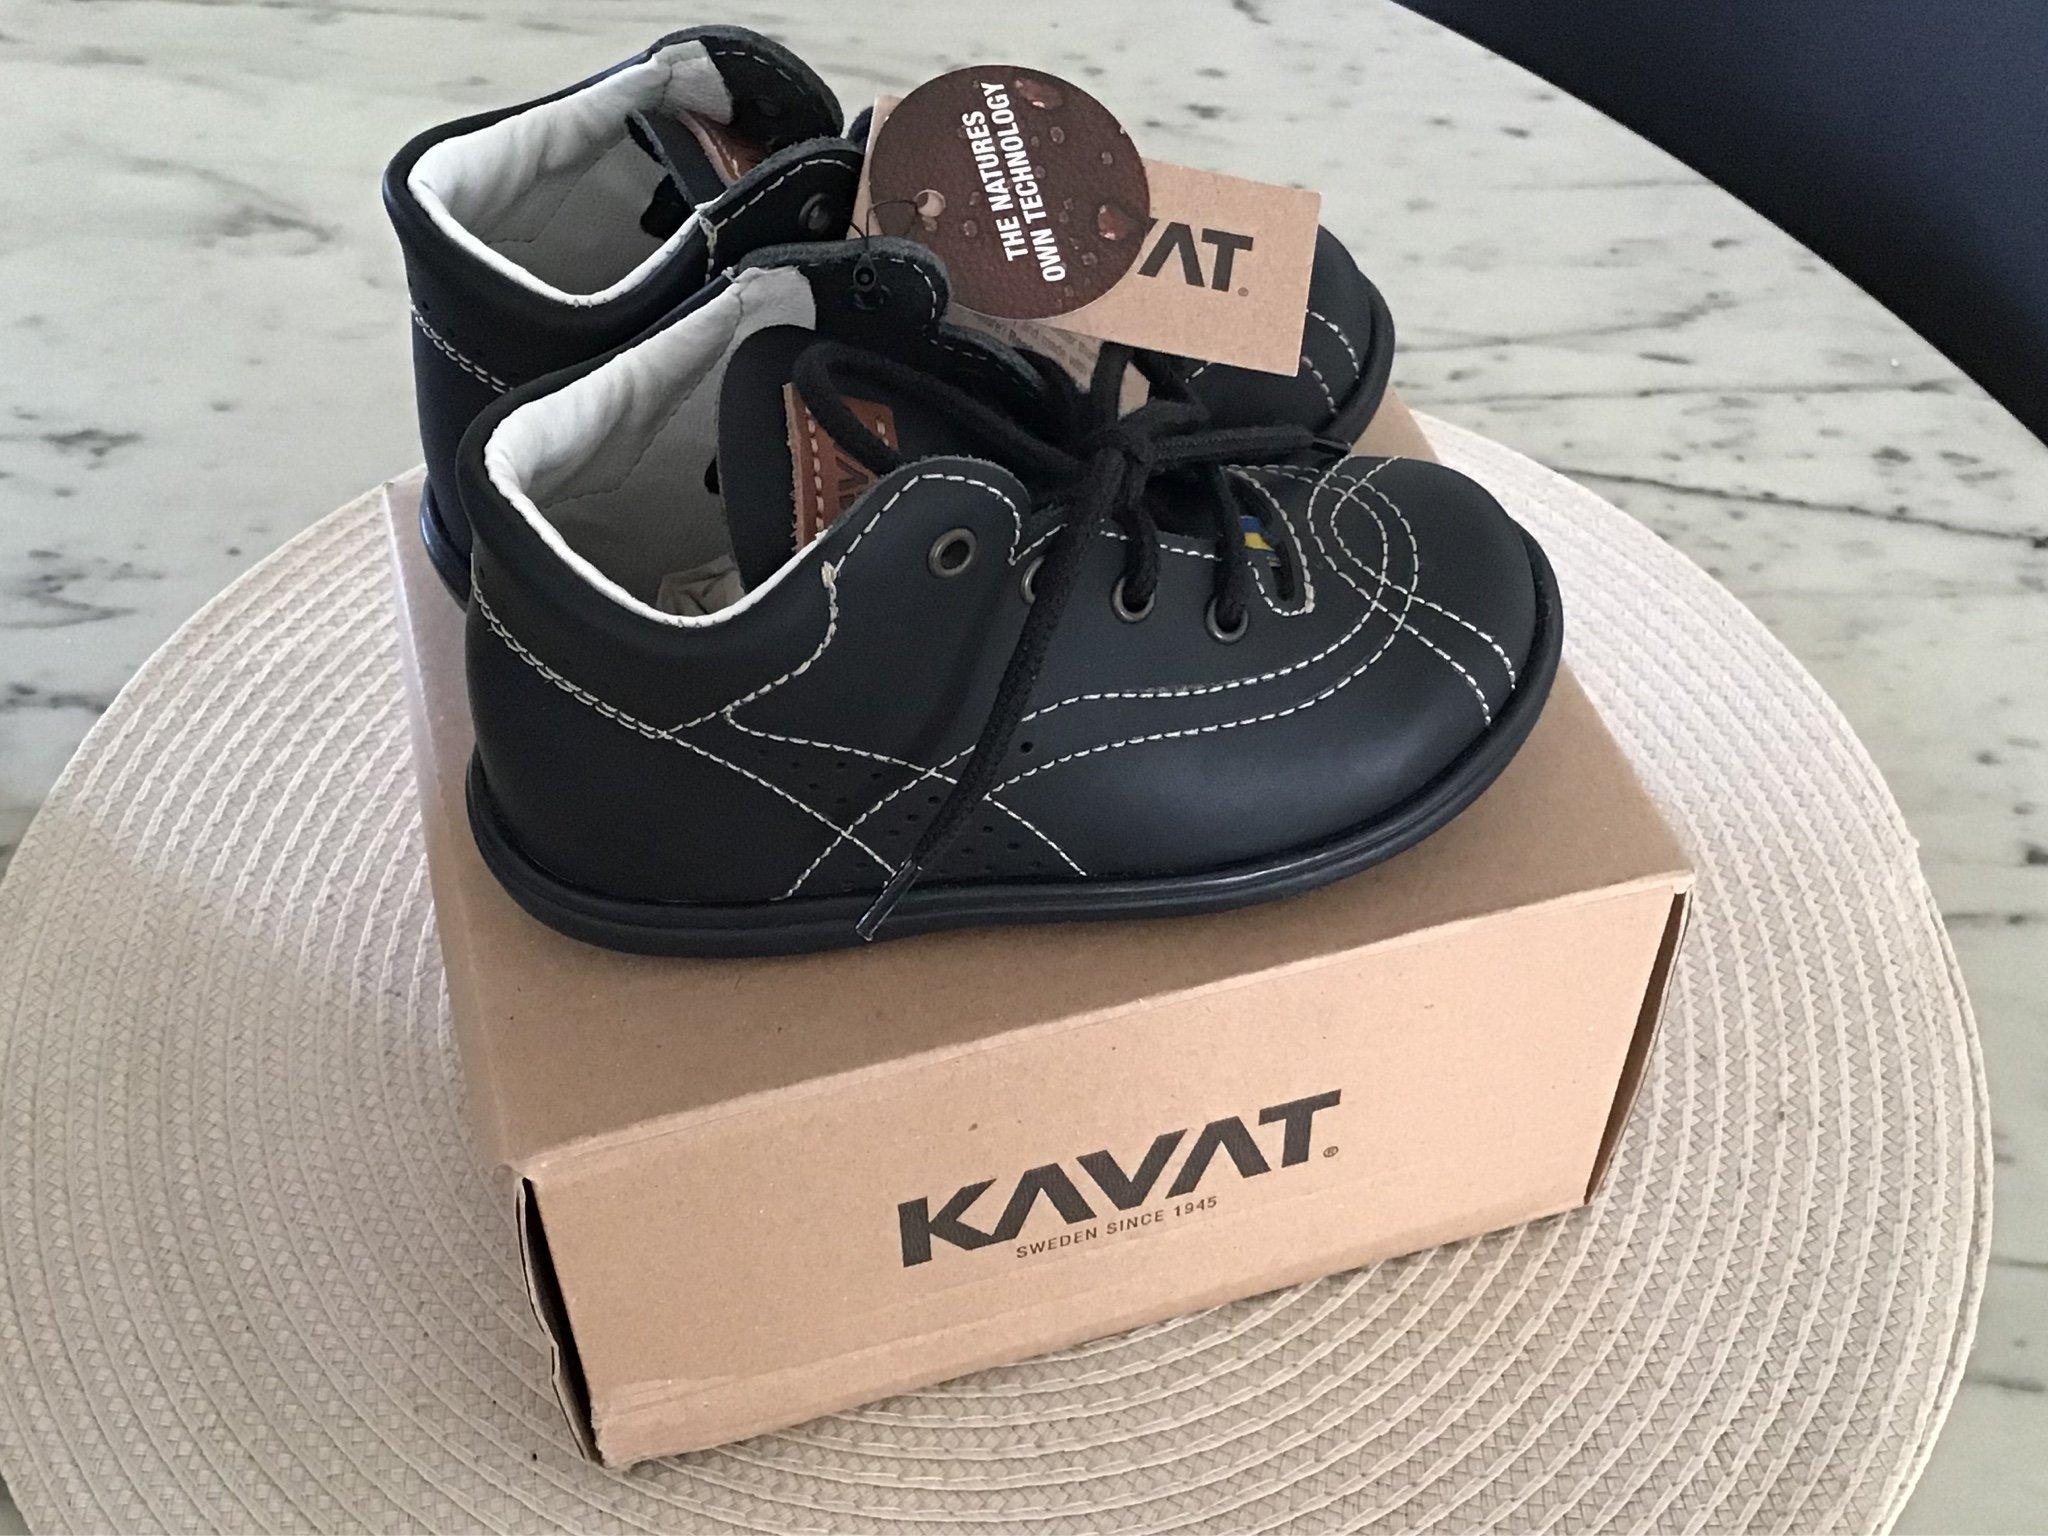 NYA i kartong KAVAT Edsbro XC Skor Svart läder skor kängor märkes lyx boots 24